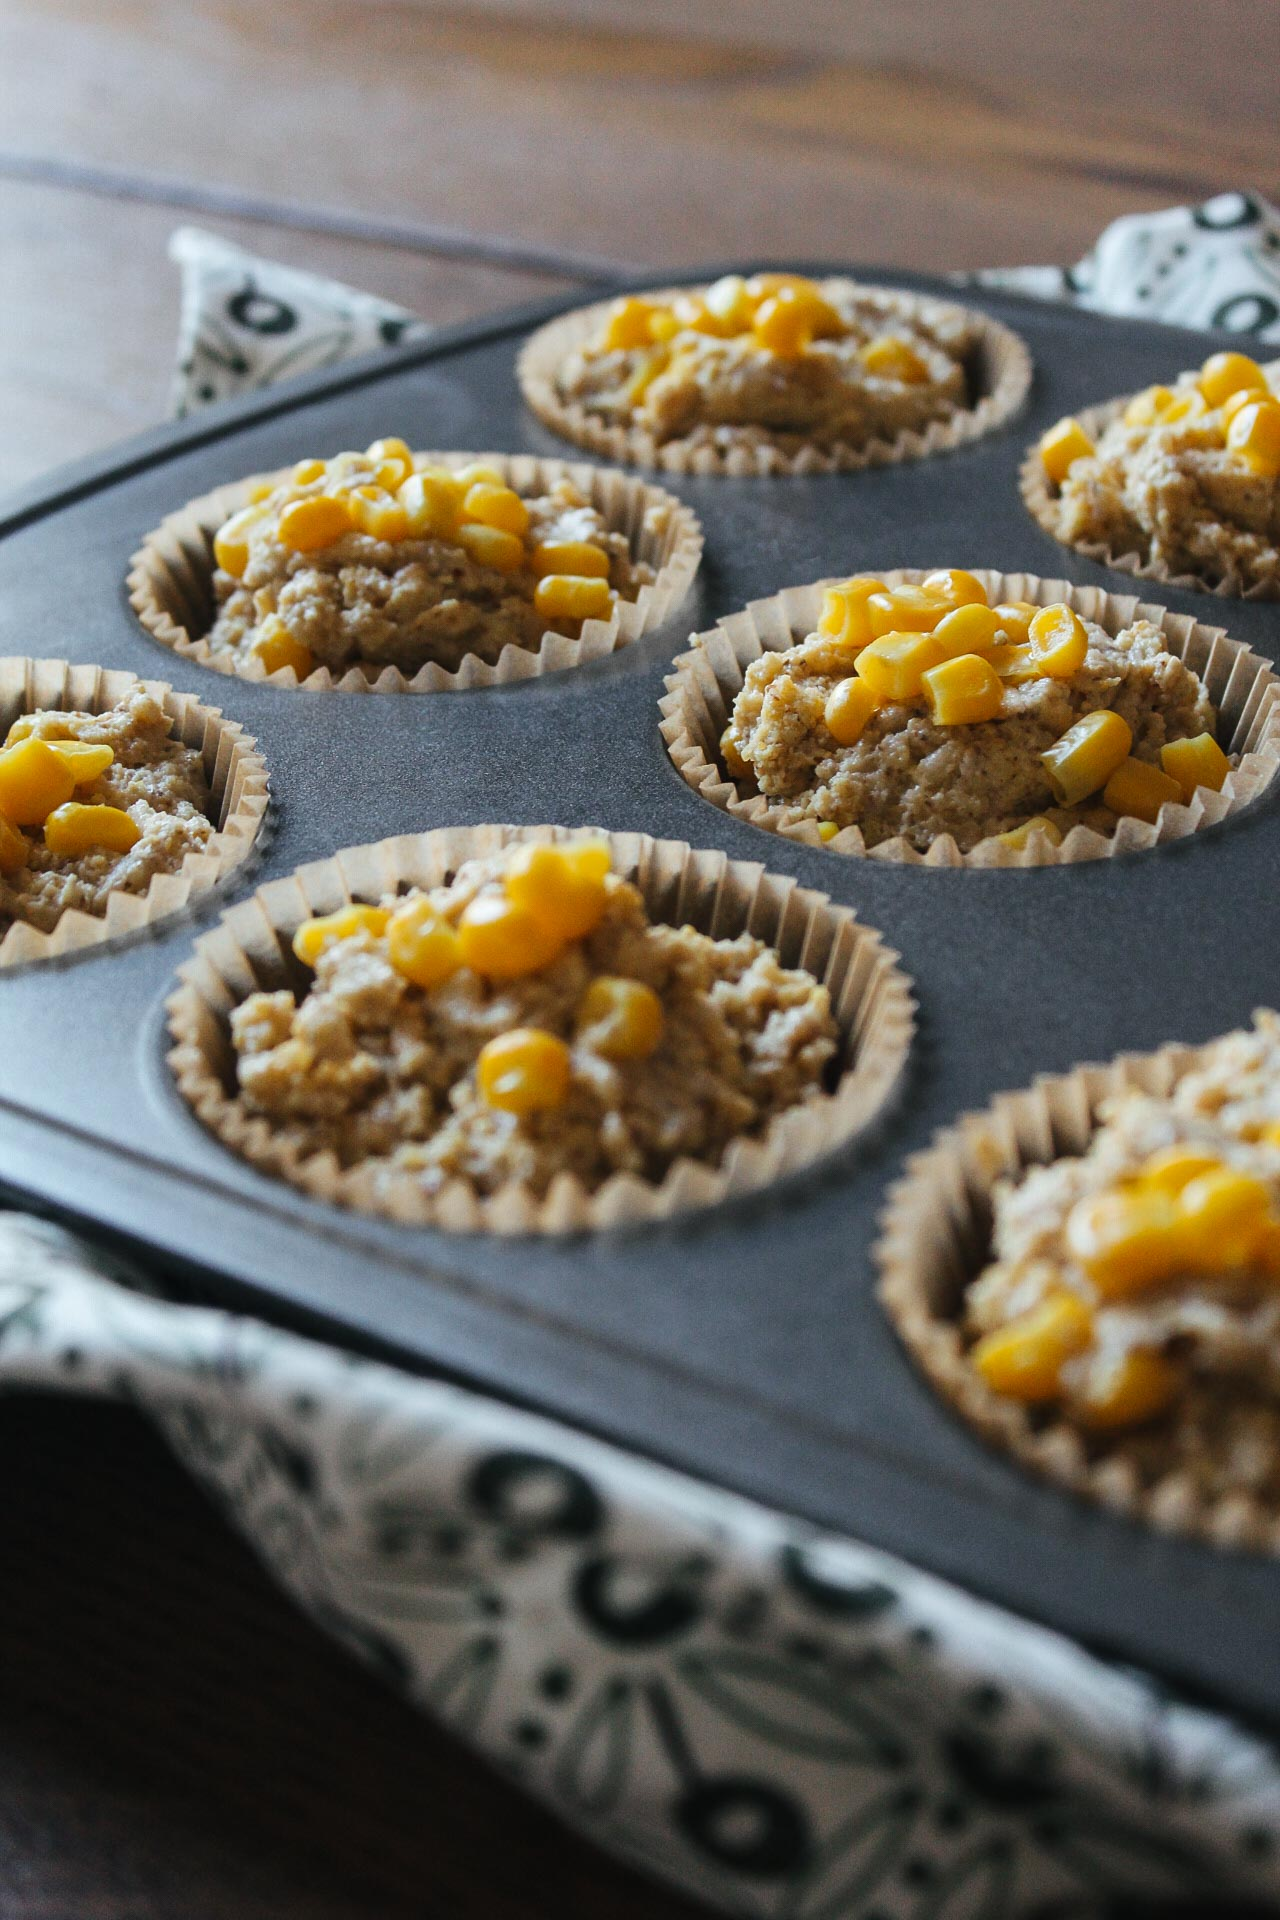 Gluten-Free Cornbread Muffins #vegan #muffins #plant-based #cornbread #recipes #wfpb #wfpbno #mcdougal #bread #side